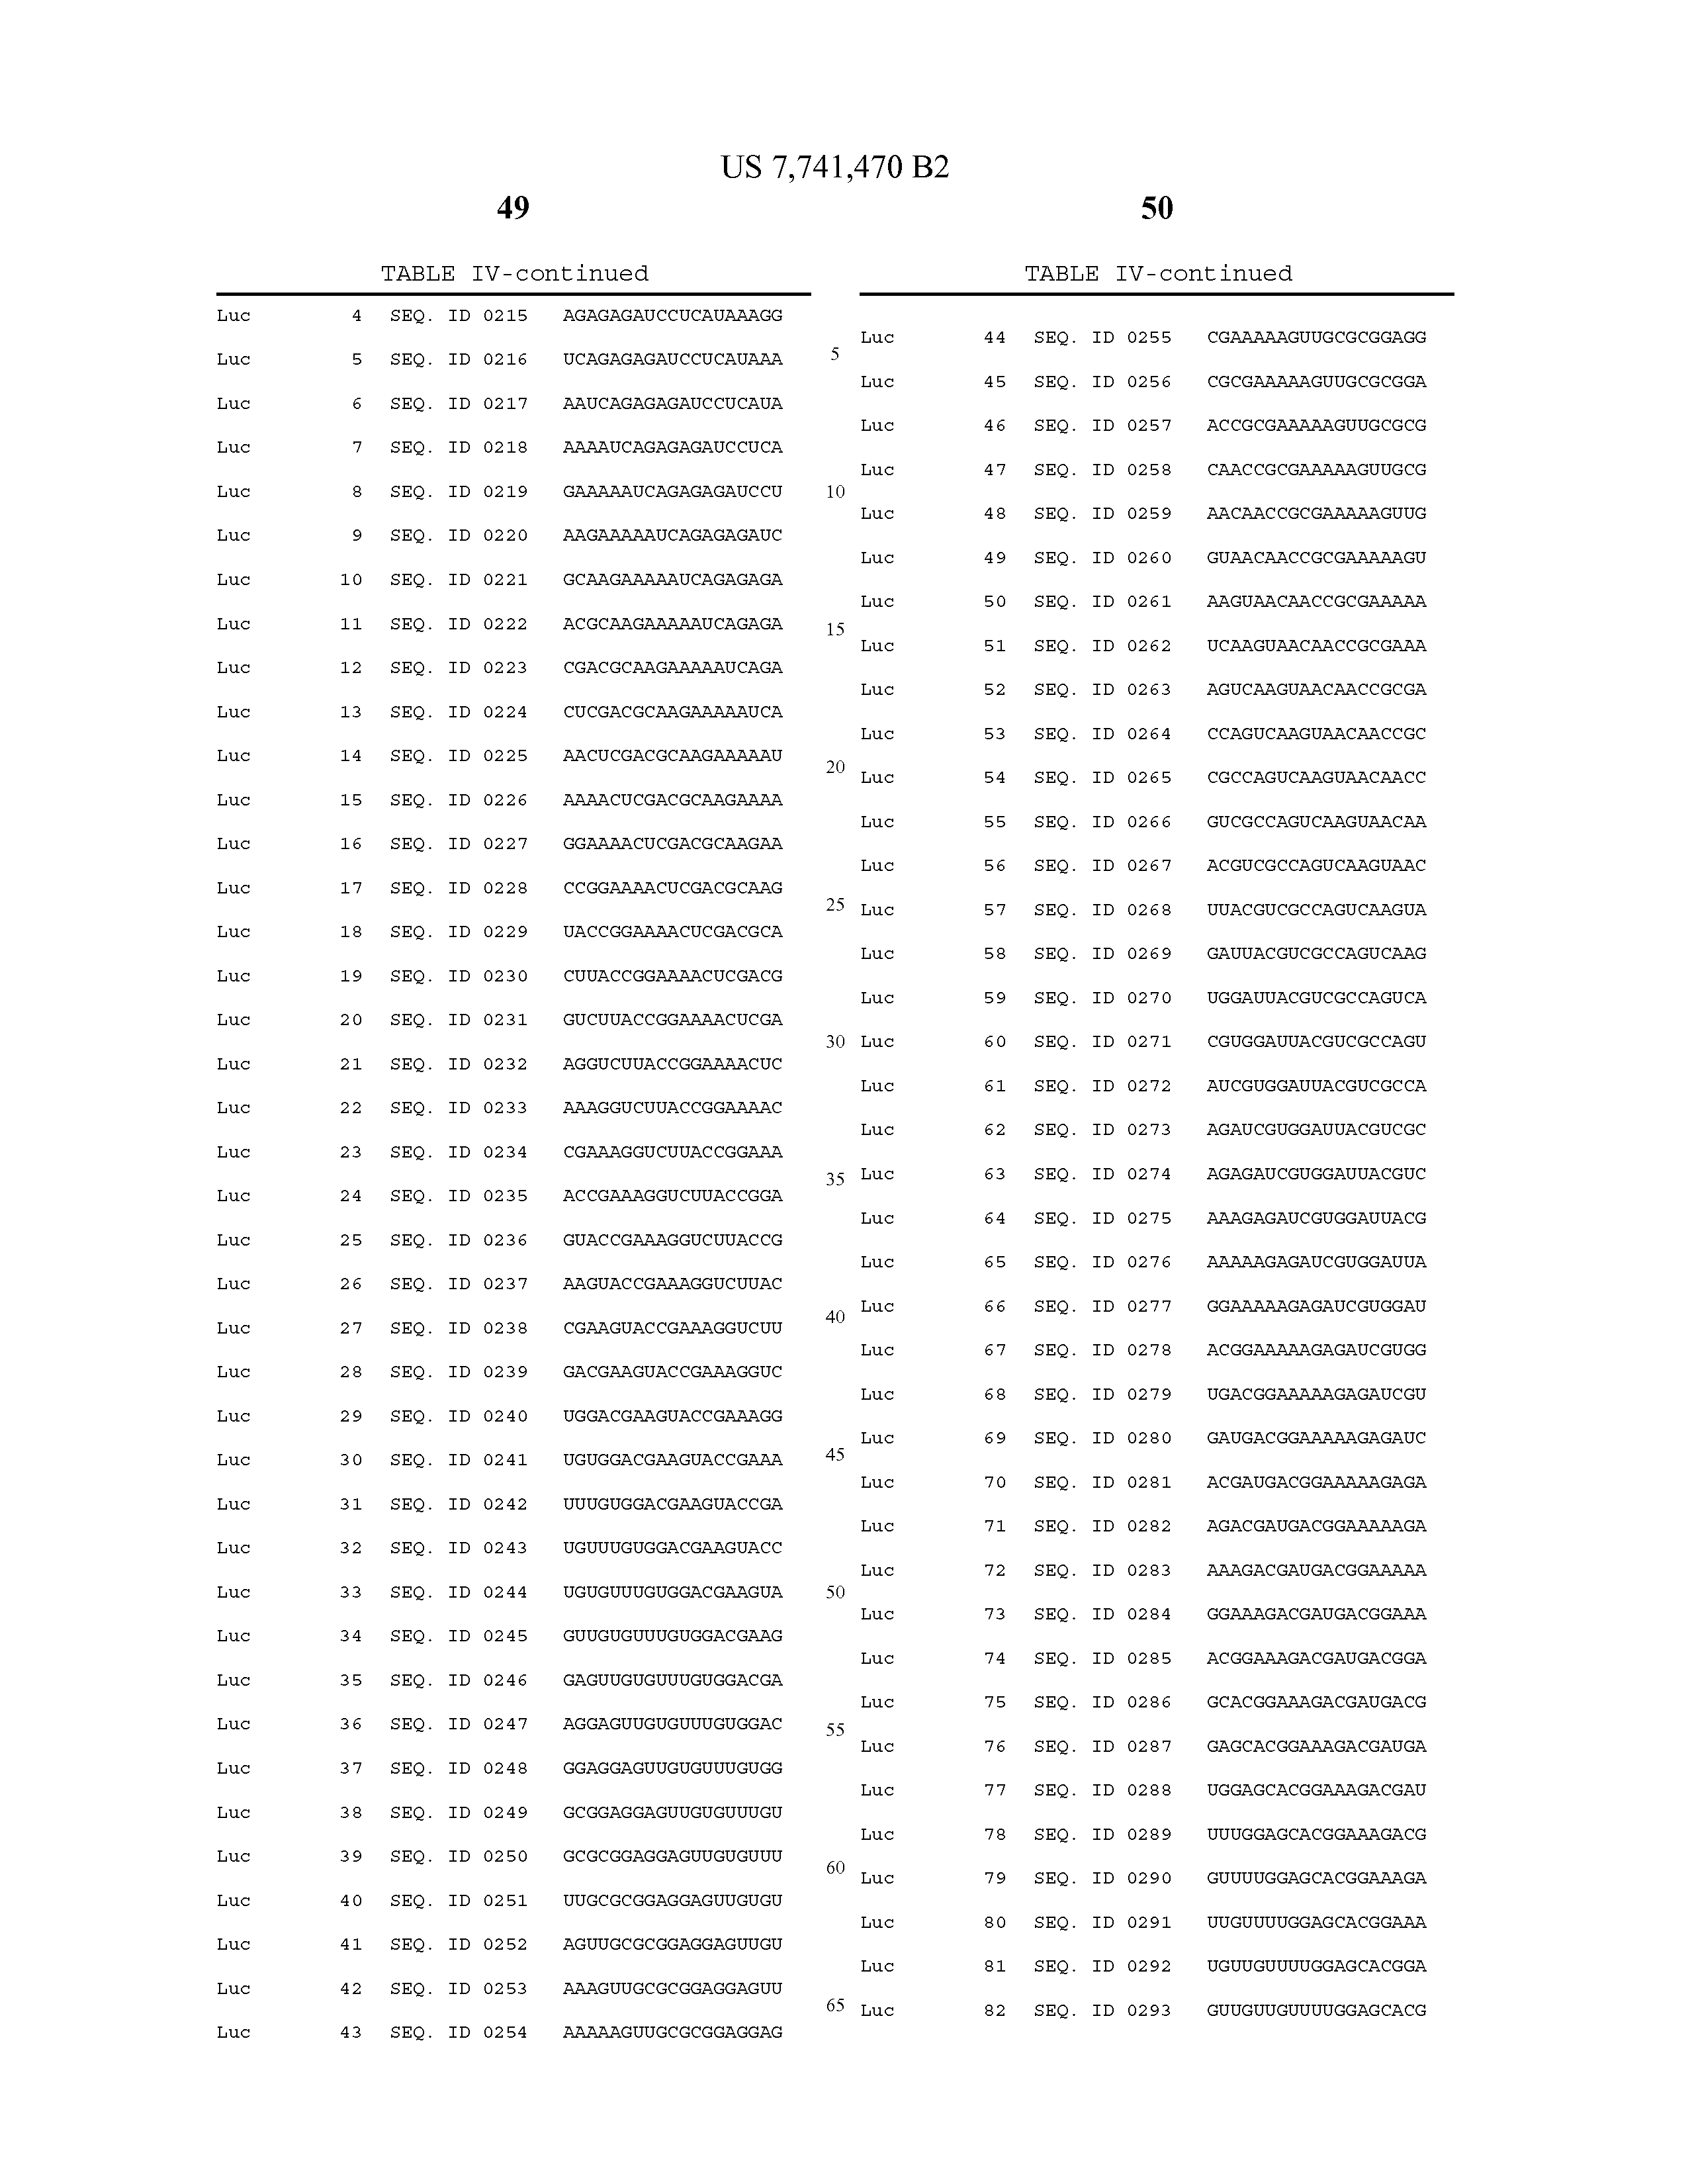 US 7741470 B2 - Sirna Targeting Gremlin - The Lens - Free